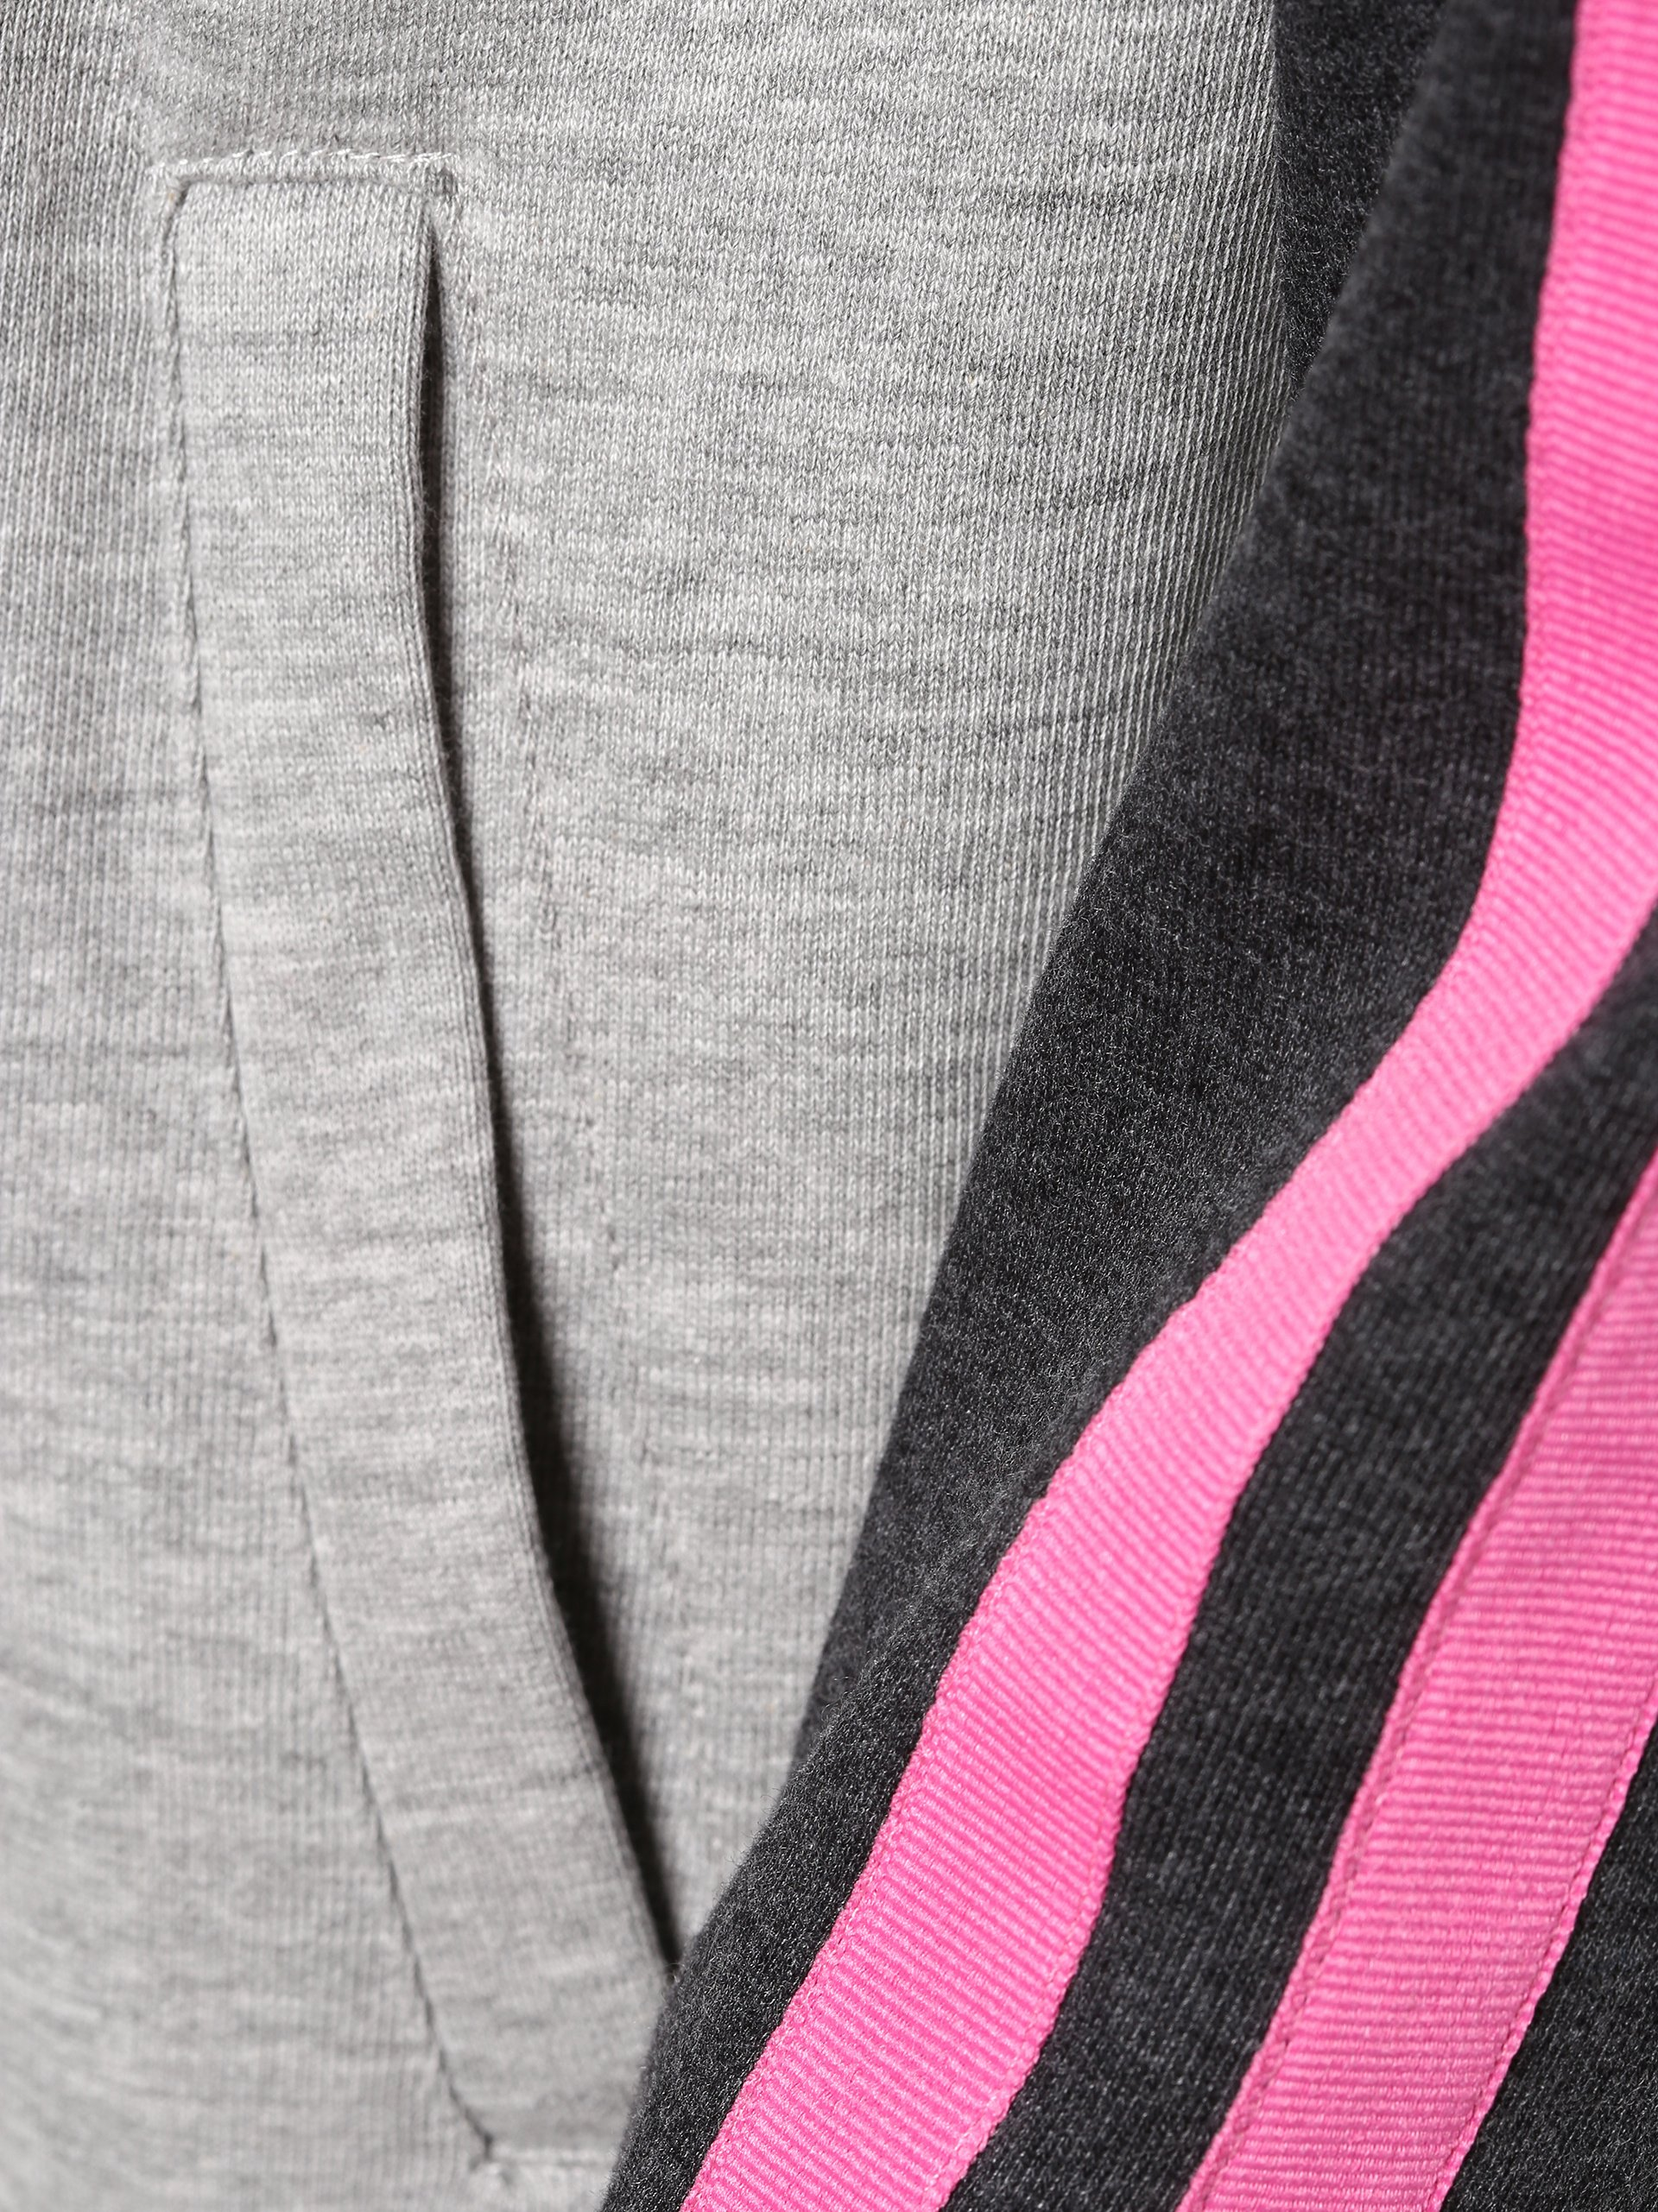 marie lund damen sweatshirt grau uni online kaufen vangraaf com. Black Bedroom Furniture Sets. Home Design Ideas